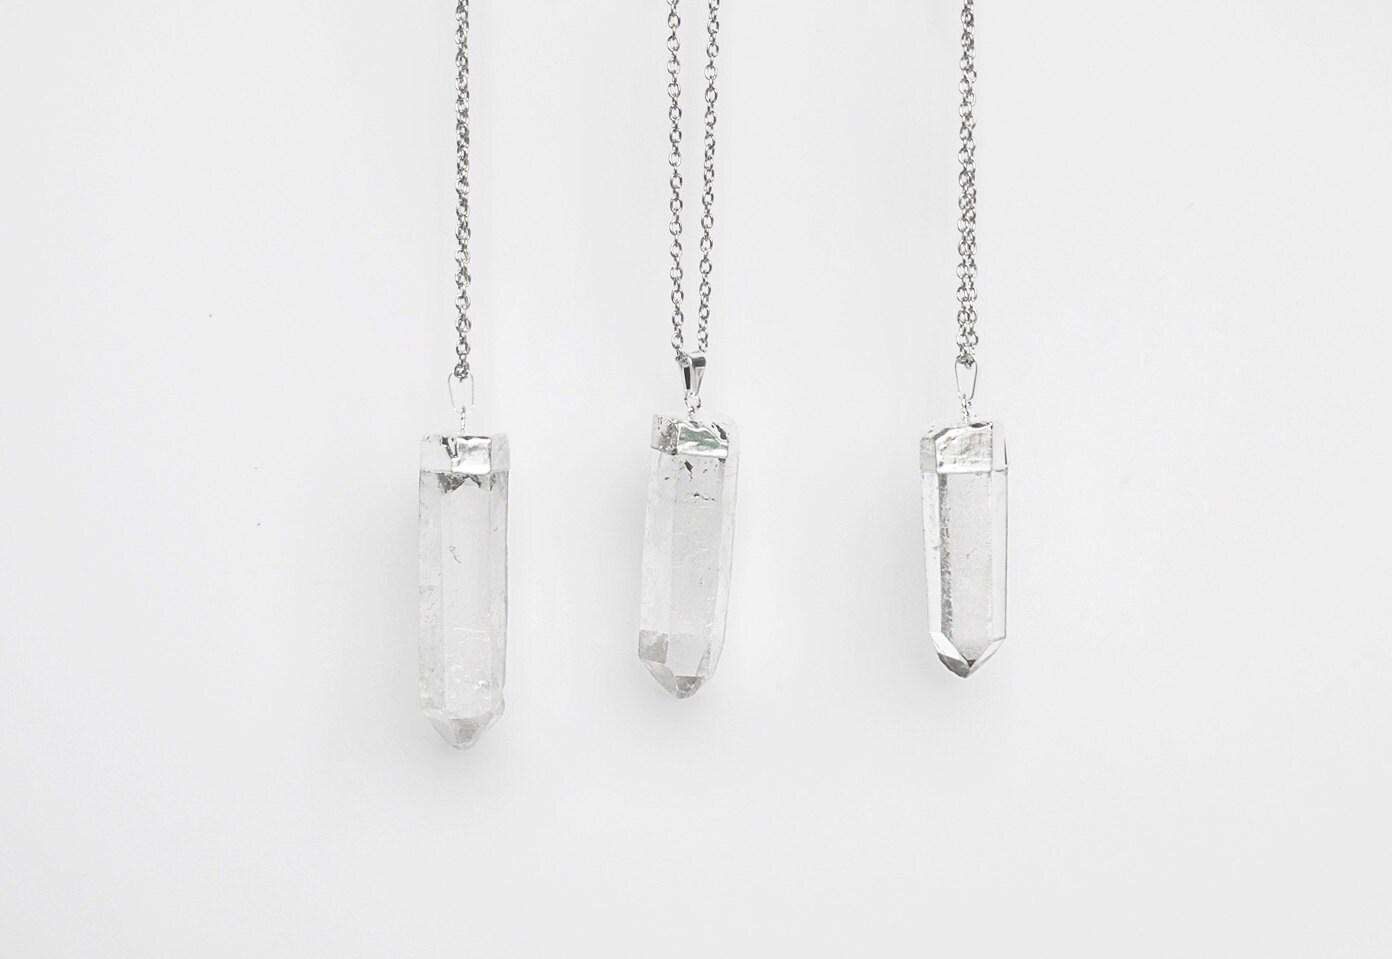 large quartz crystal pendant necklace silver plated raw. Black Bedroom Furniture Sets. Home Design Ideas